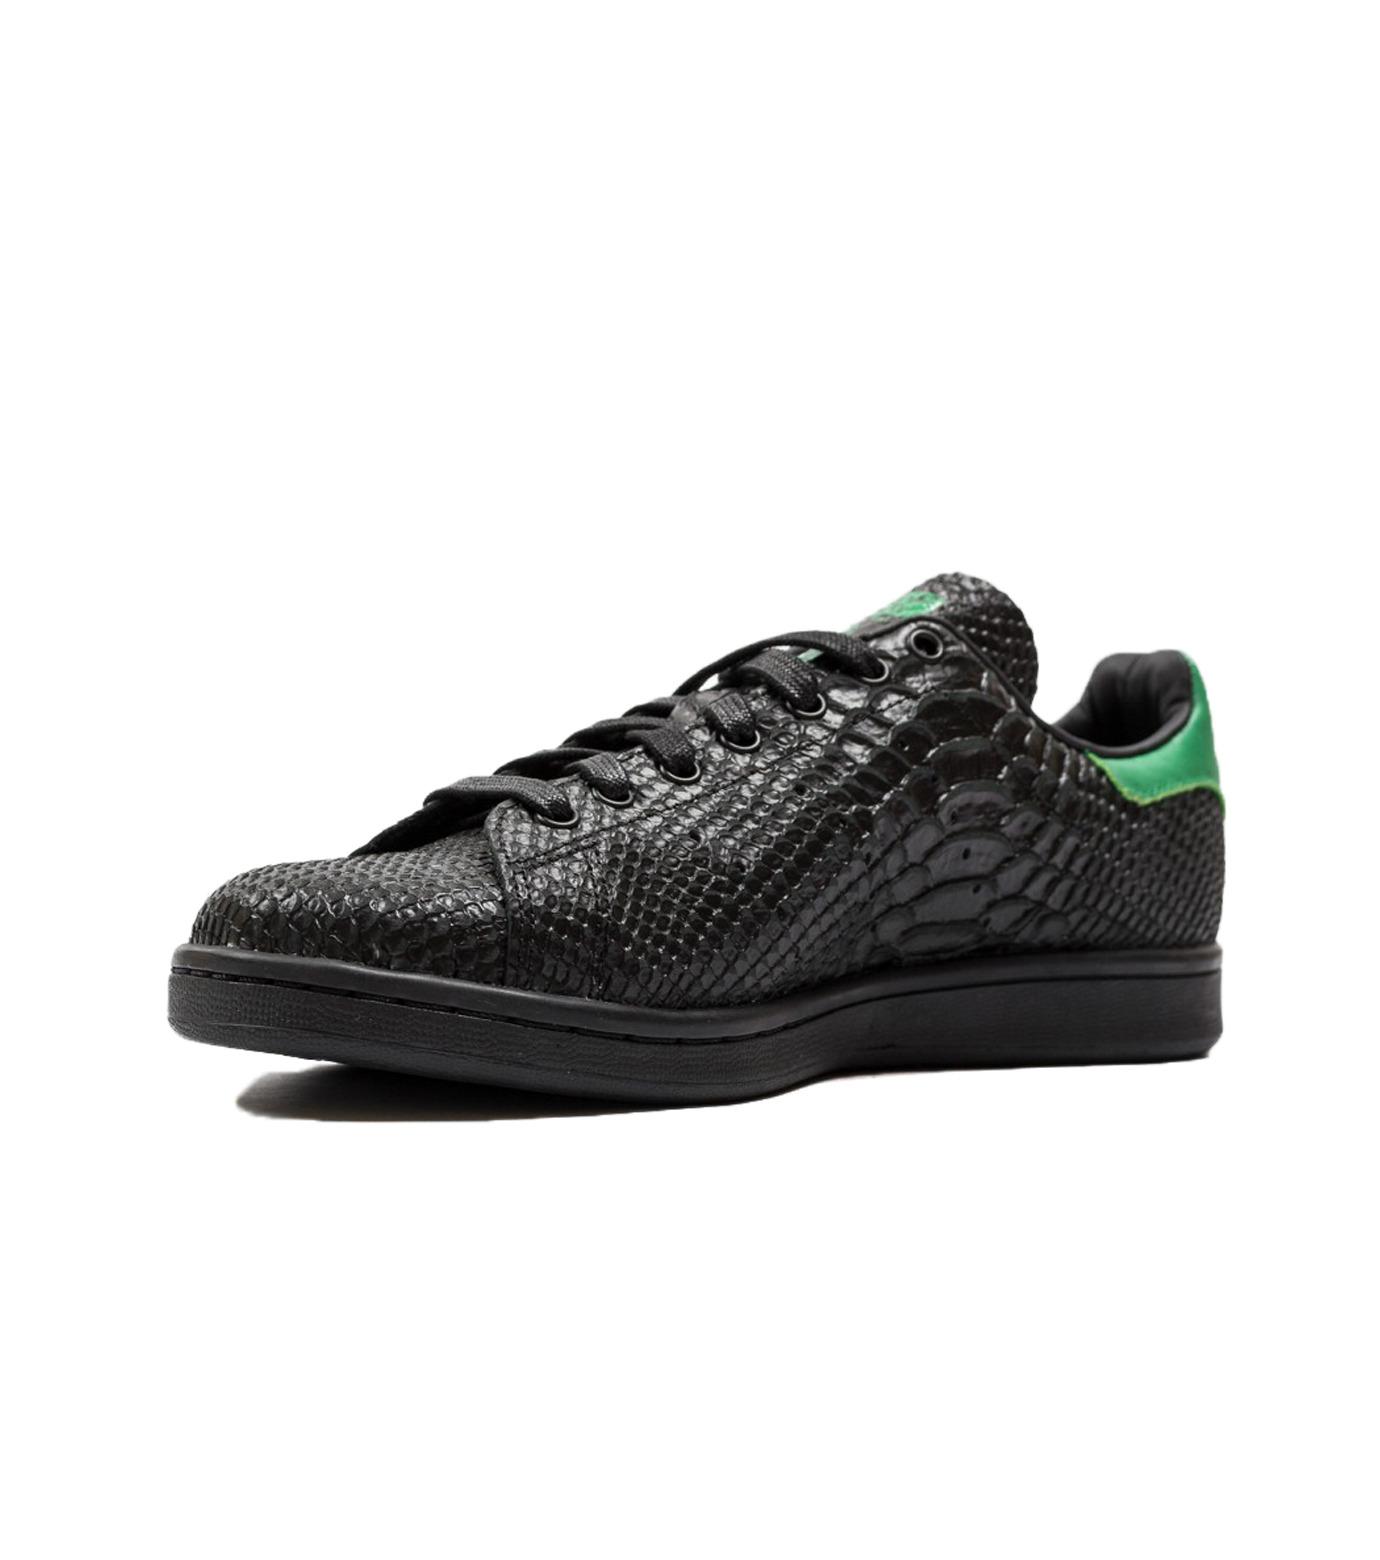 adidas(アディダス)のSUPERSTAR 80s-BLACK(シューズ/shoes)-S80022-13 拡大詳細画像4